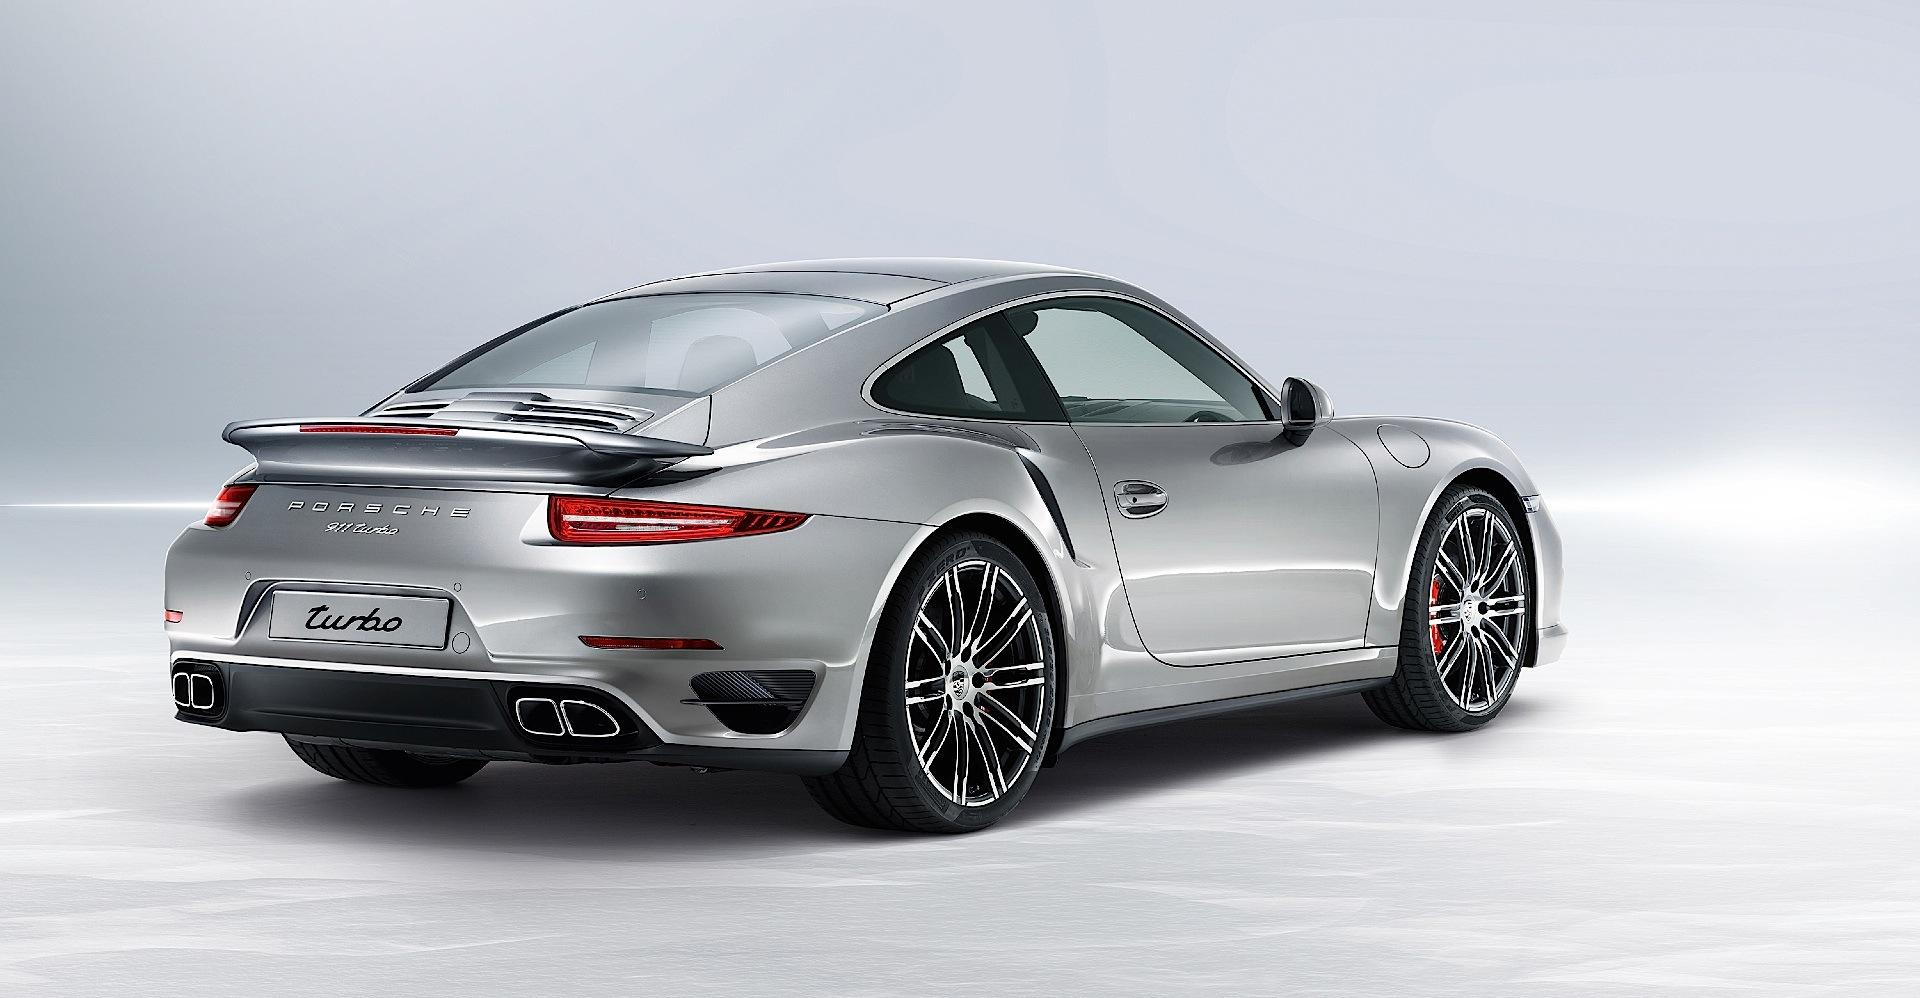 Car Steerying Wallpaper Porsche 911 Turbo 991 Specs Amp Photos 2013 2014 2015